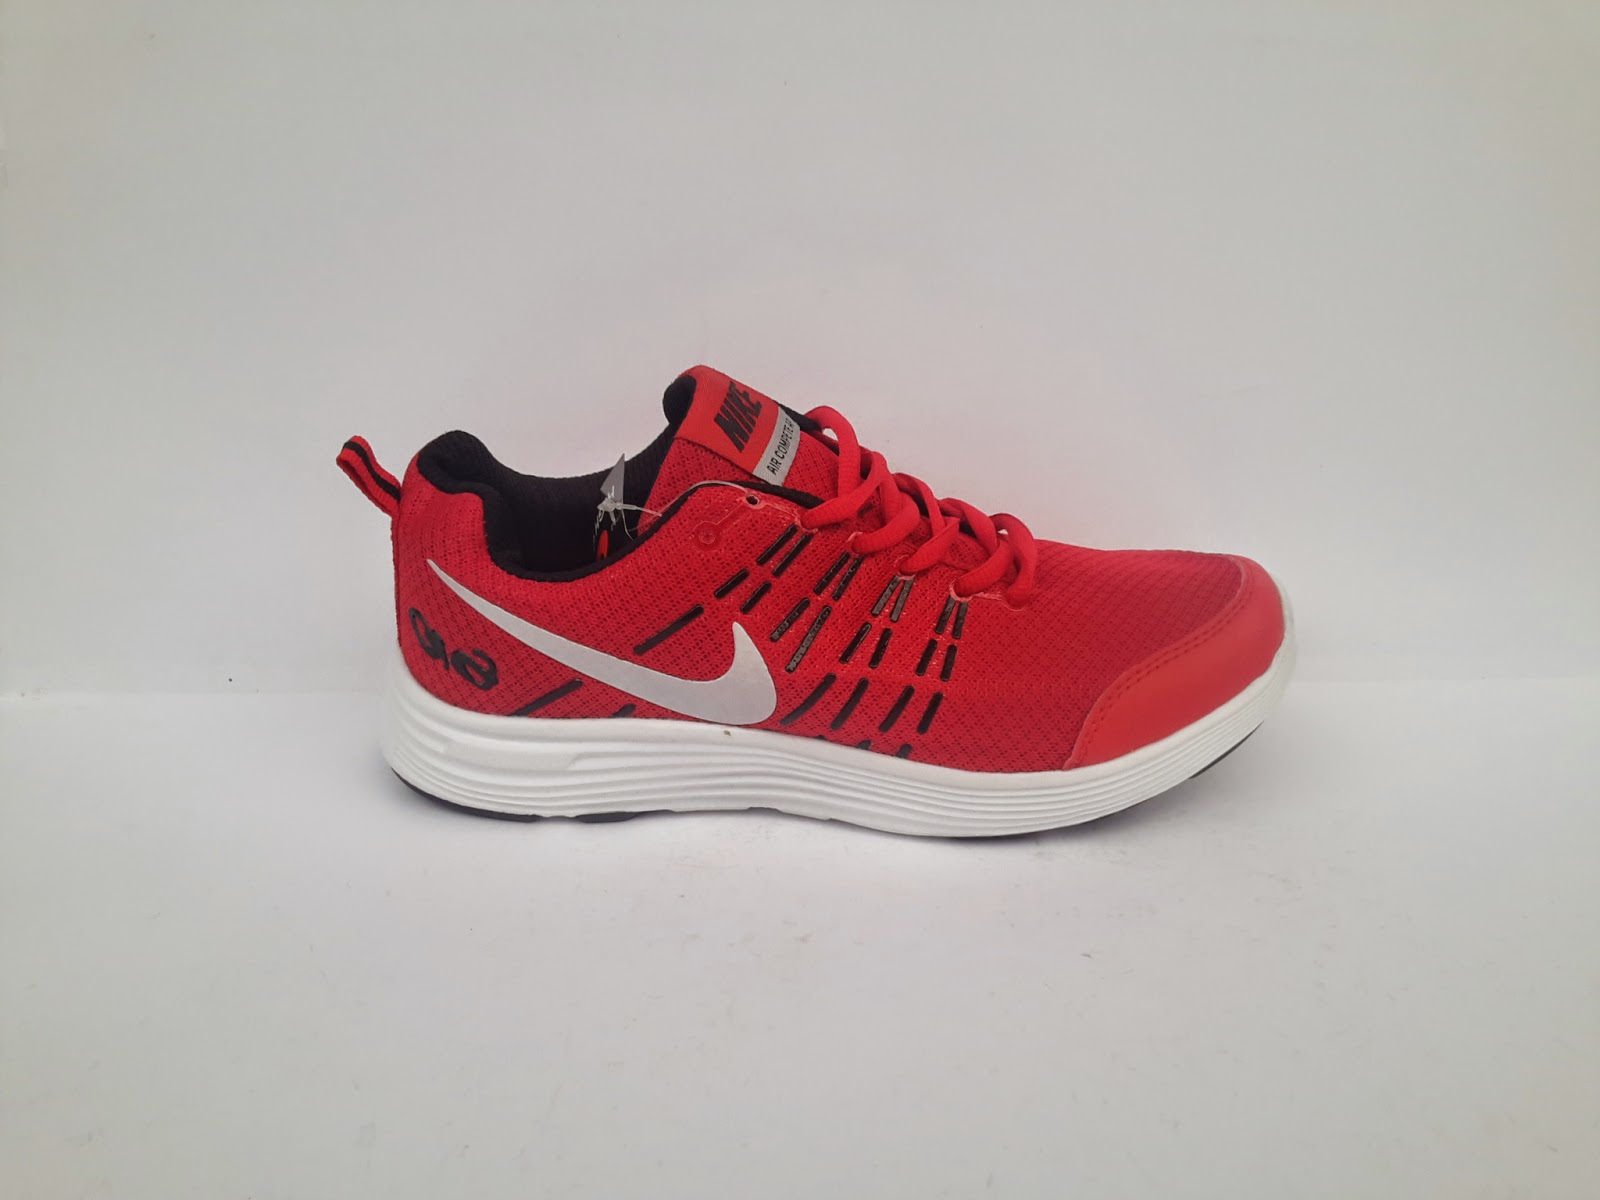 Sepatu Nike Free Running  6.0 Terbaru